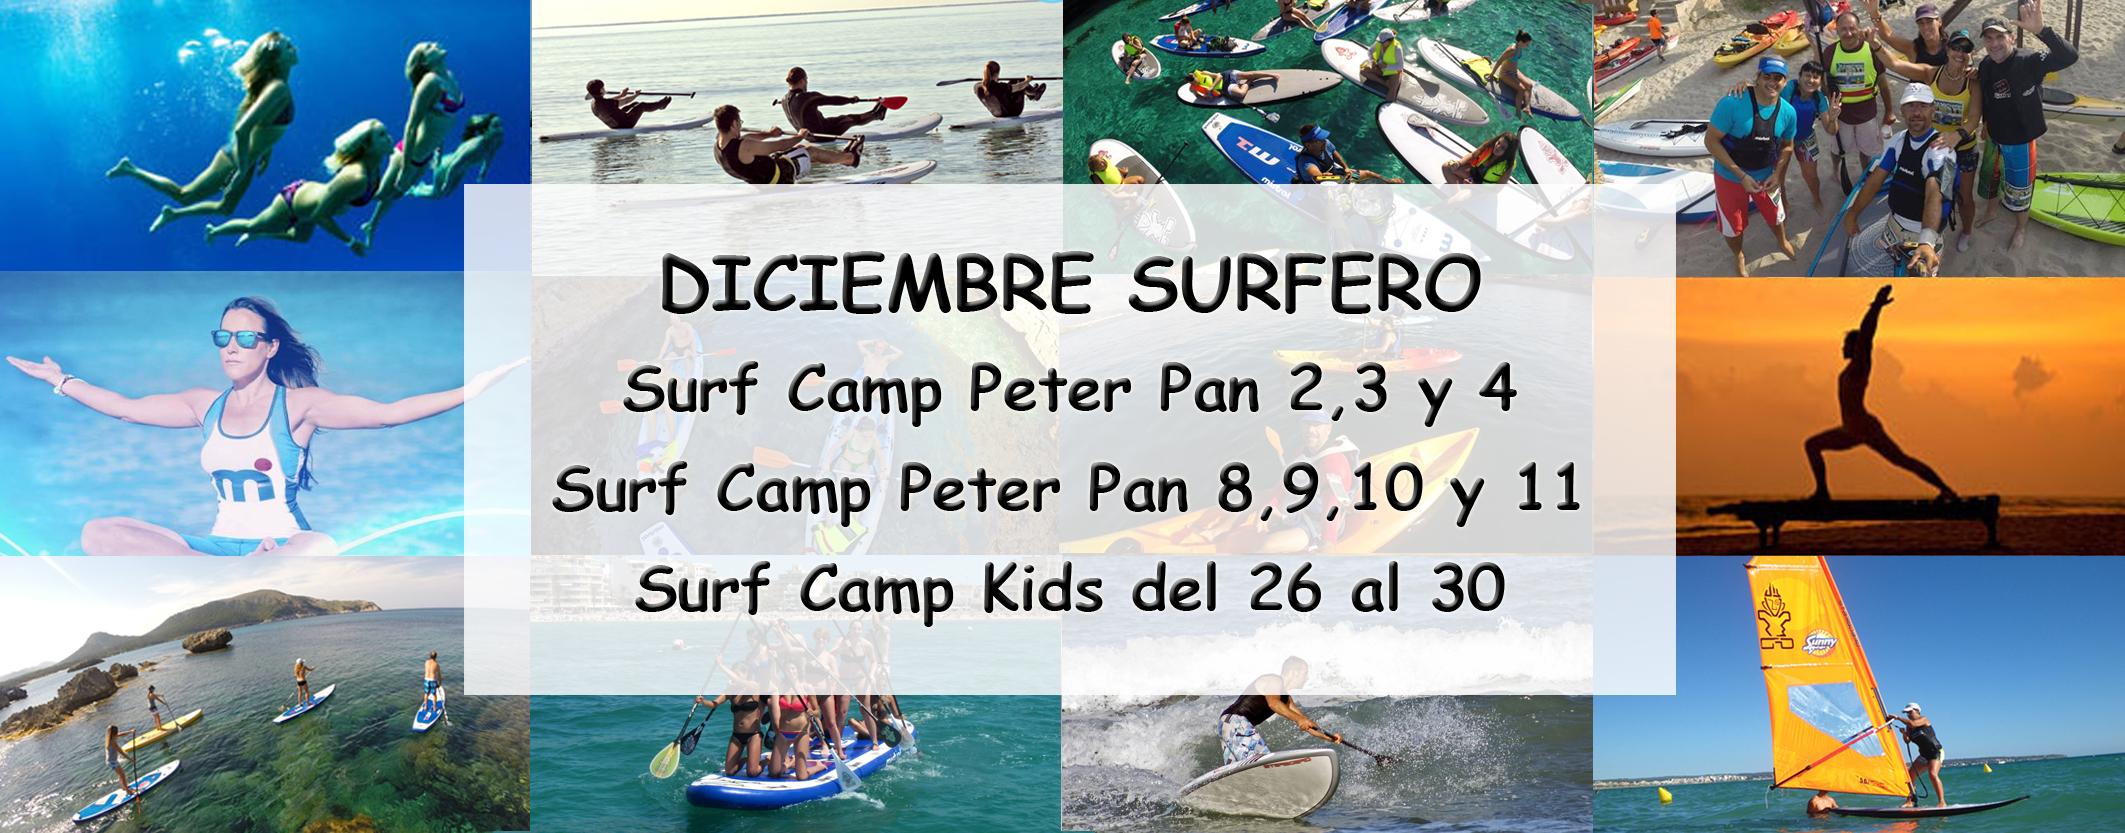 SurfCampPeter16